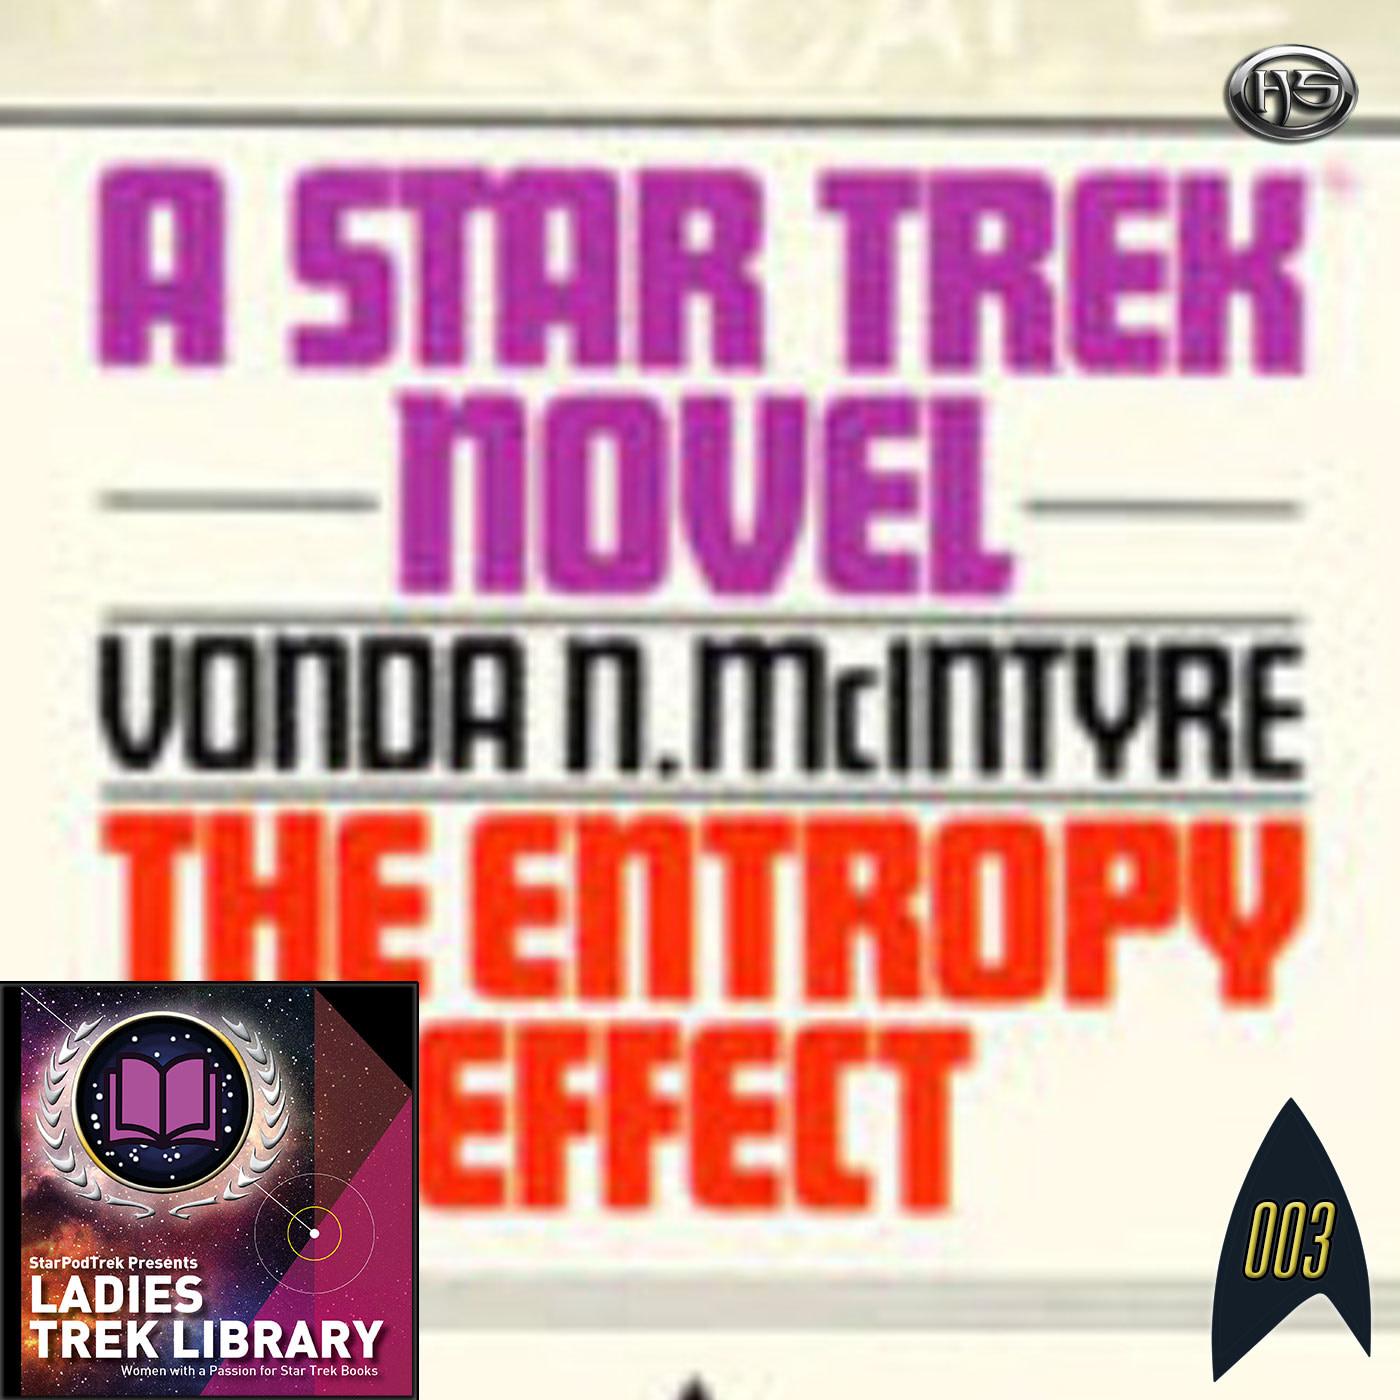 Ladies Trek Library Episode 3